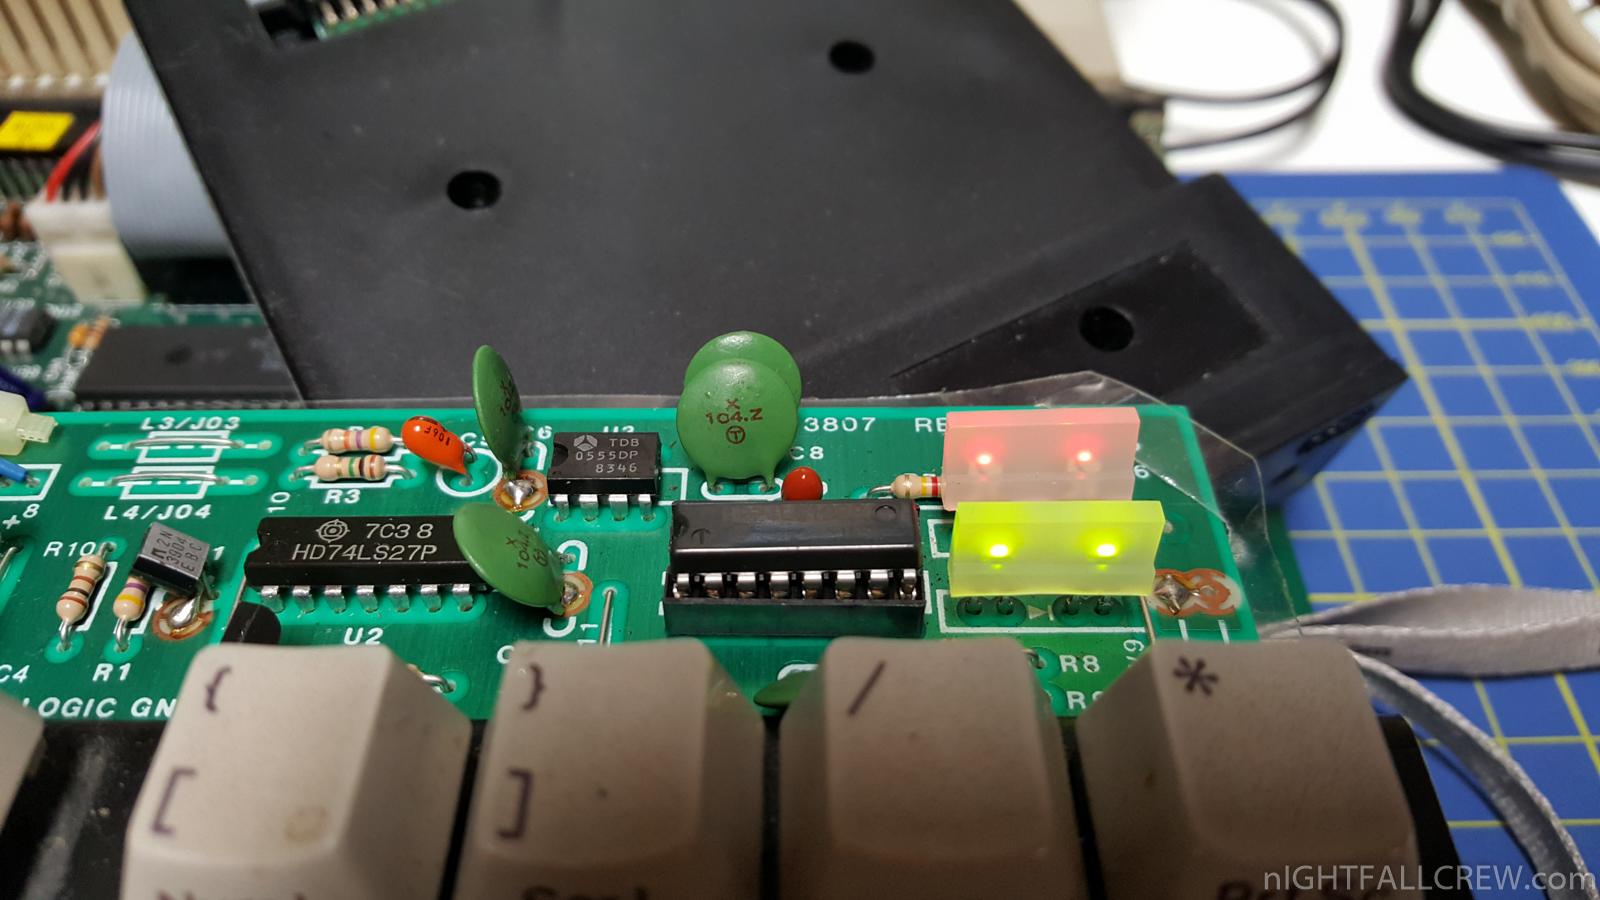 2 x Commodore Amiga 500 Keyboard Repair | nIGHTFALL Blog